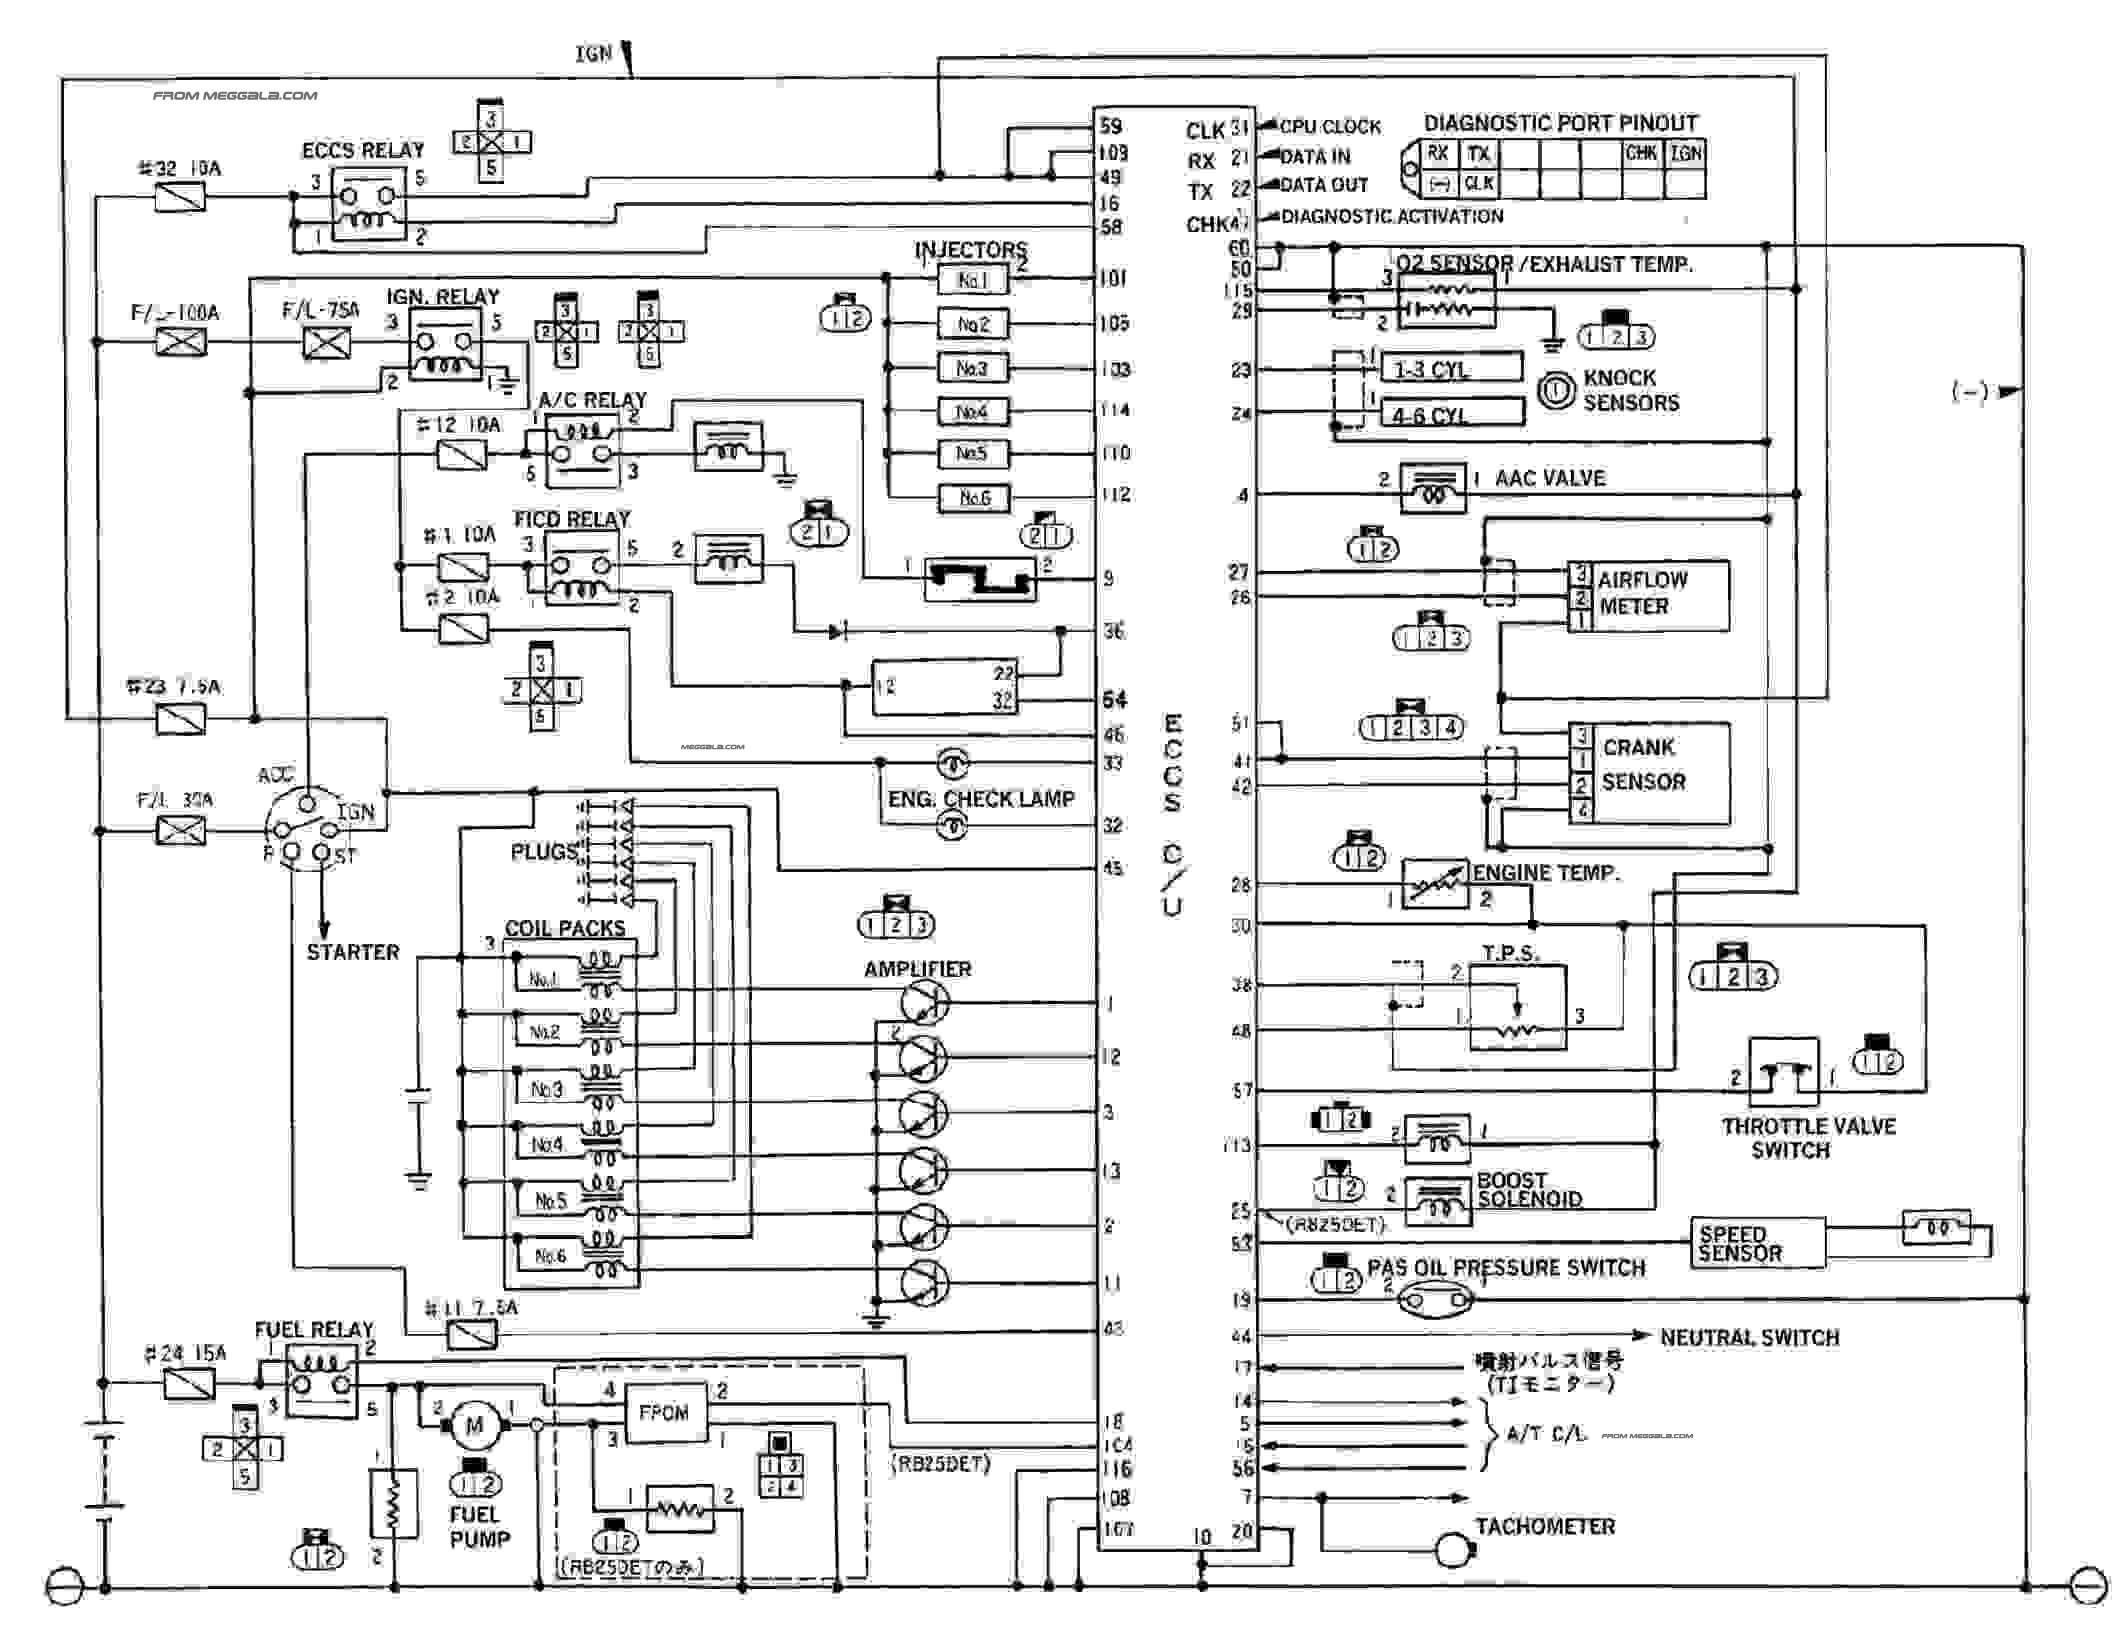 [DIAGRAM ZW_7331] 300Zx Ecu Wiring Diagram Full Version